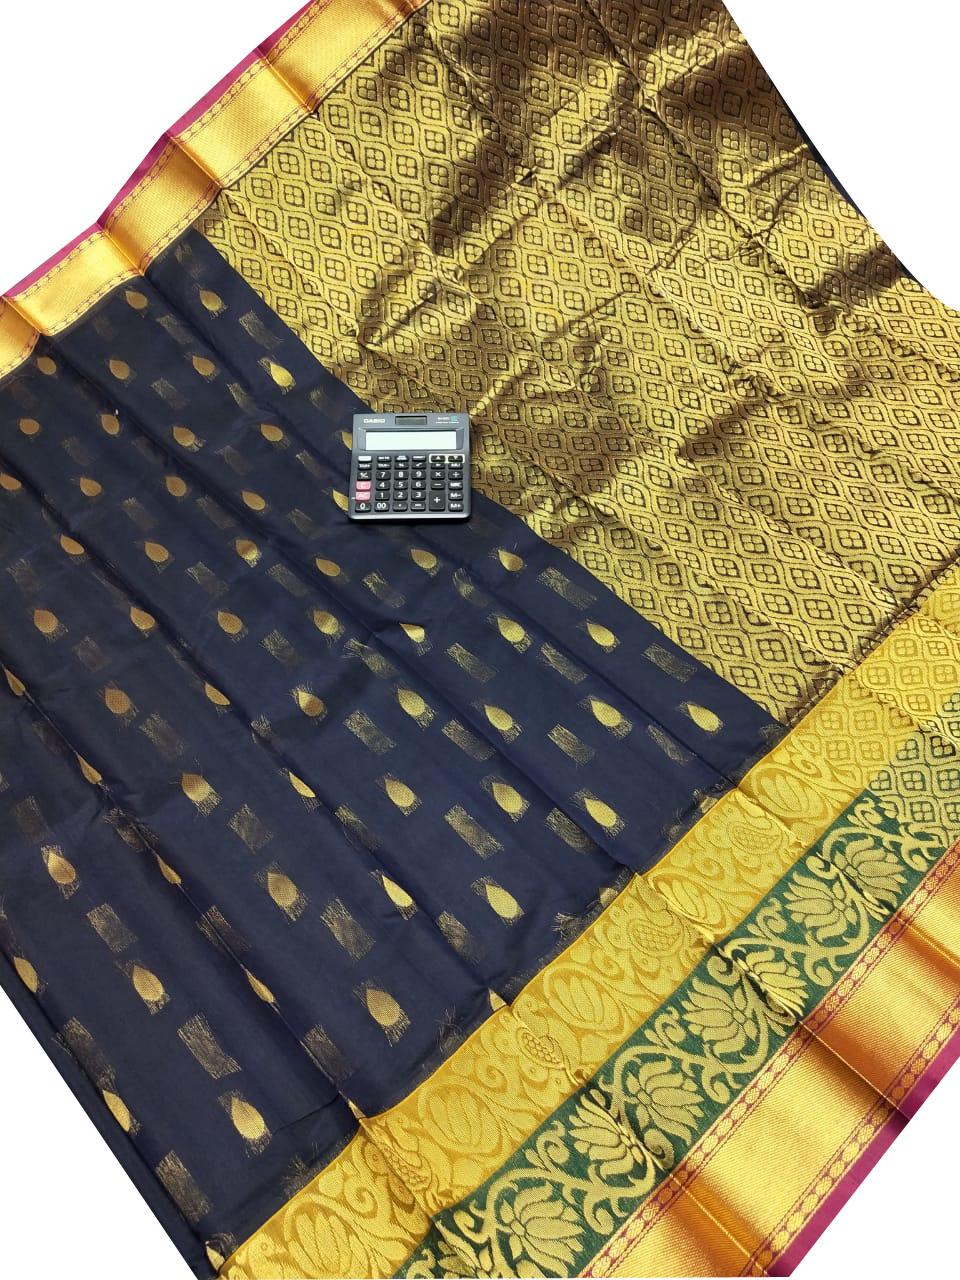 Black and golden chanderi kuppadam all over butta saree